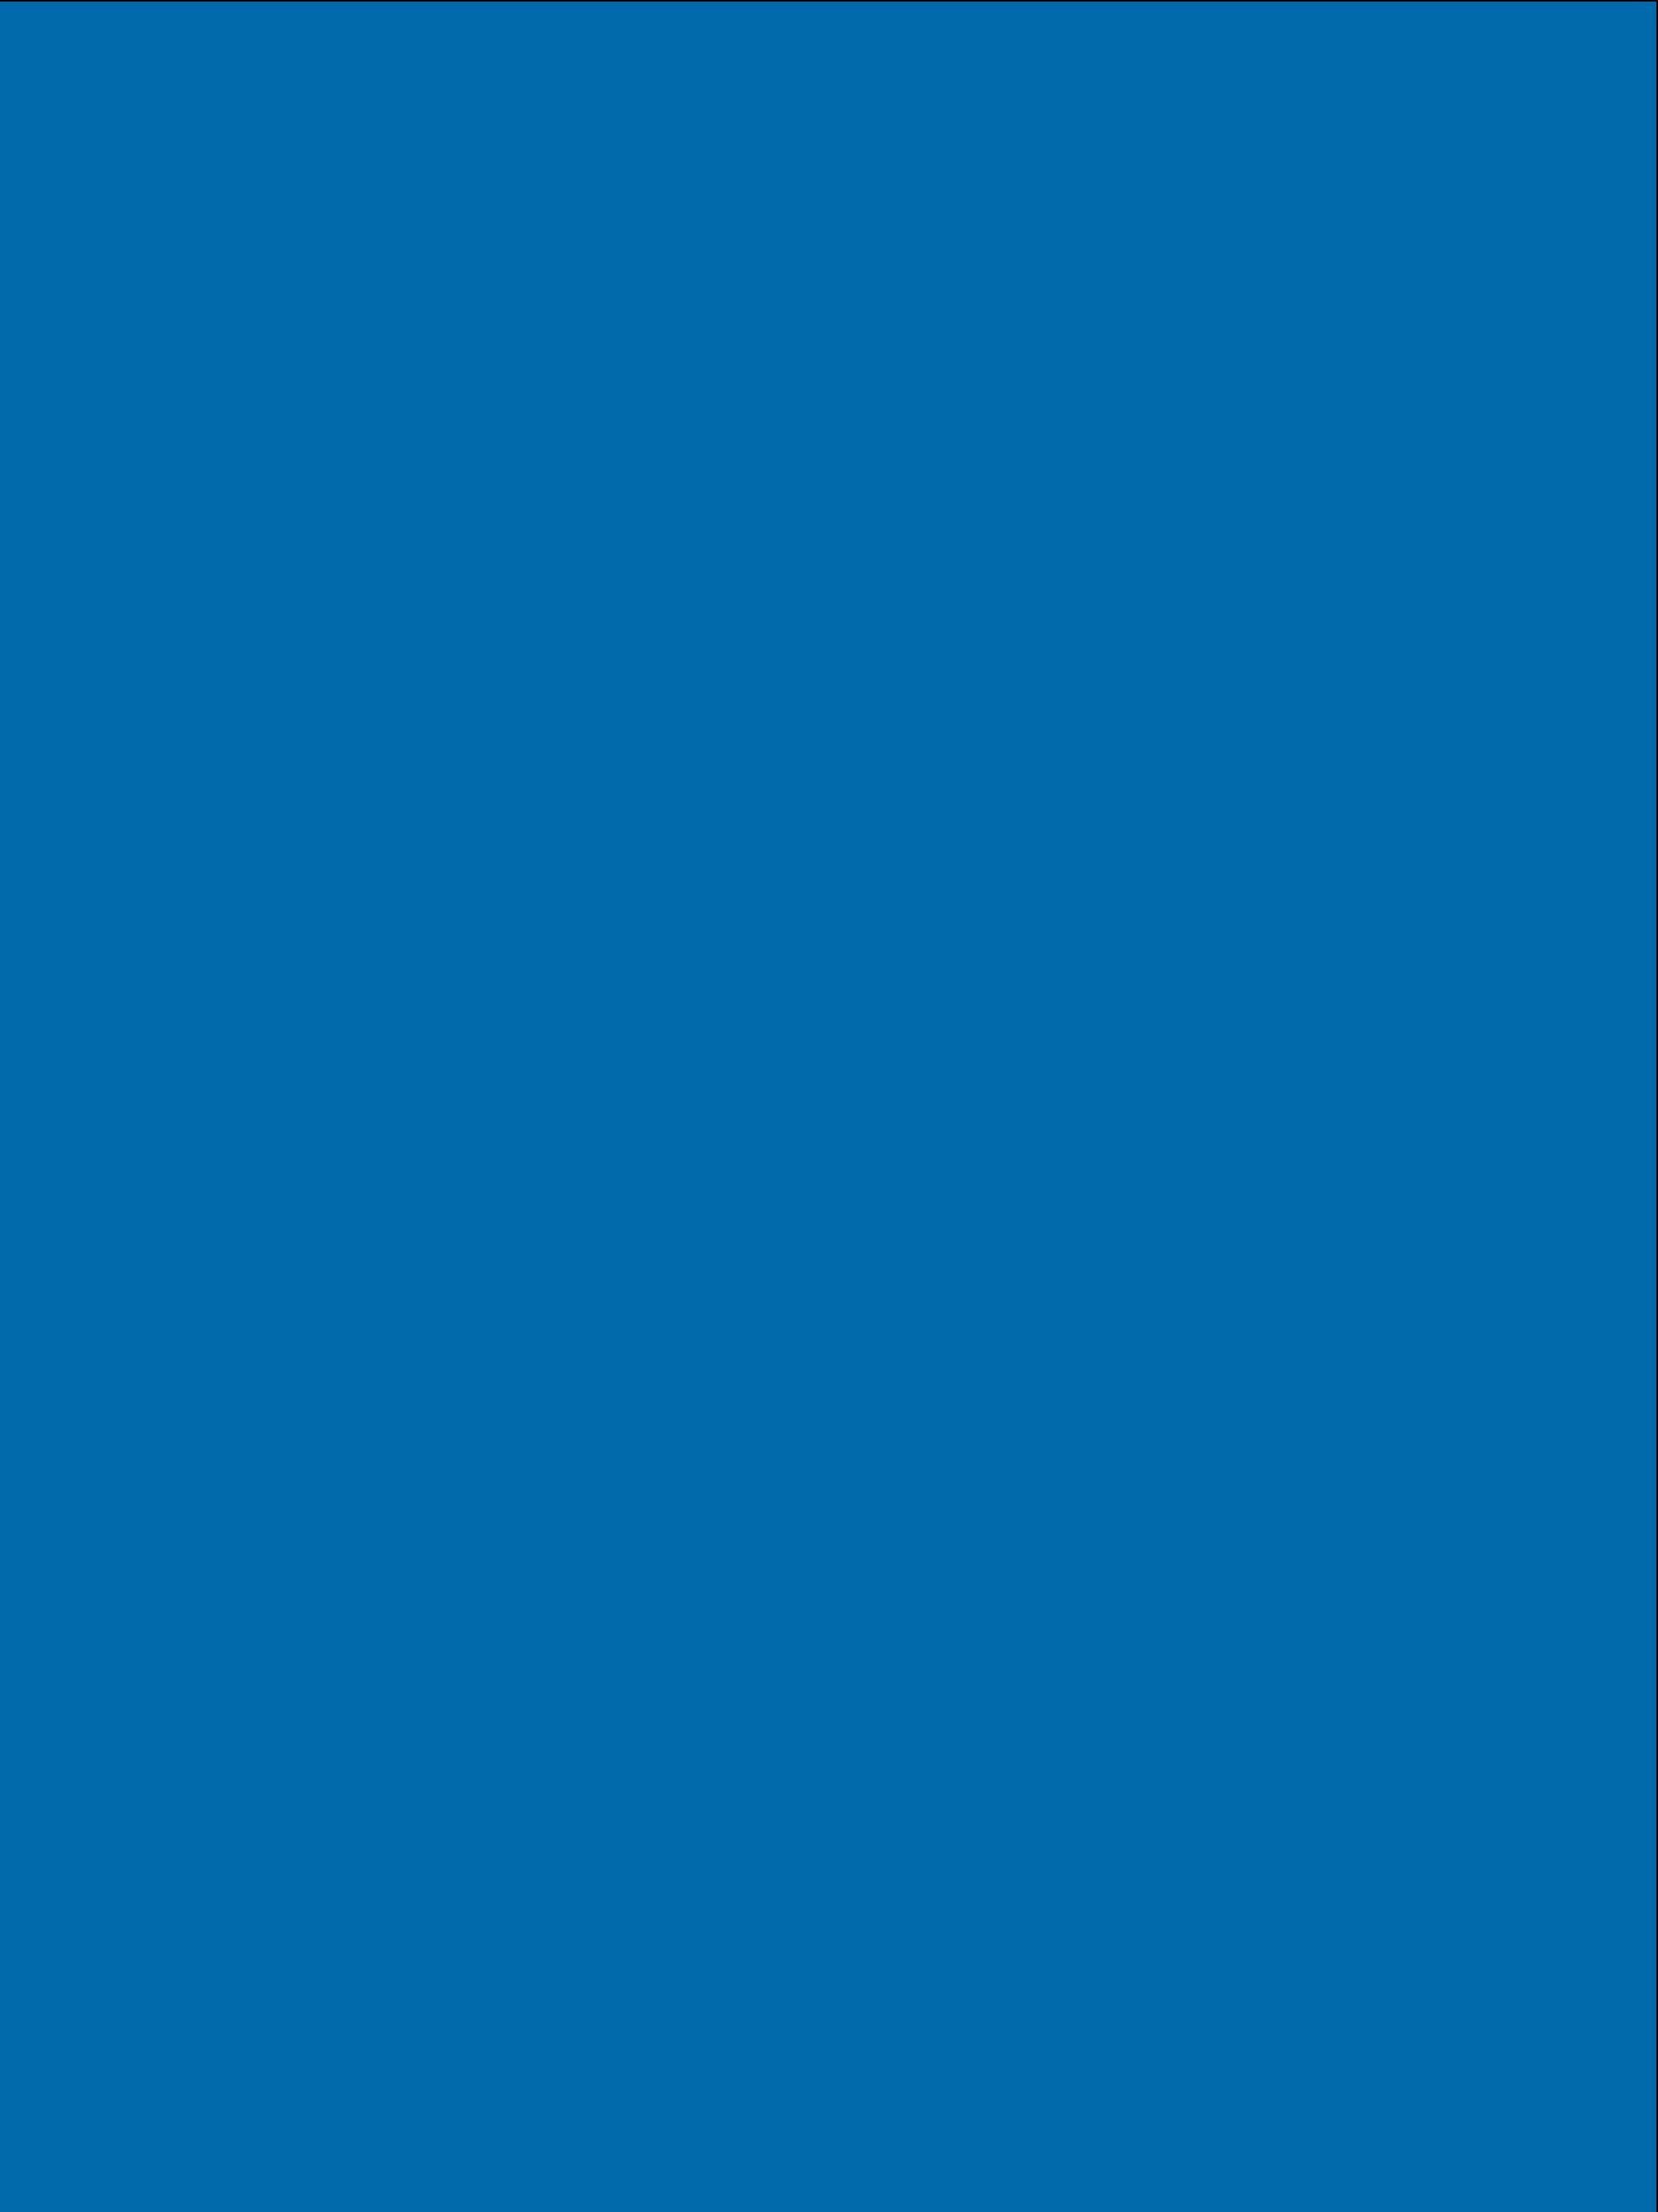 Ipad Vertical_2048x2732_Plaid_Blue.png